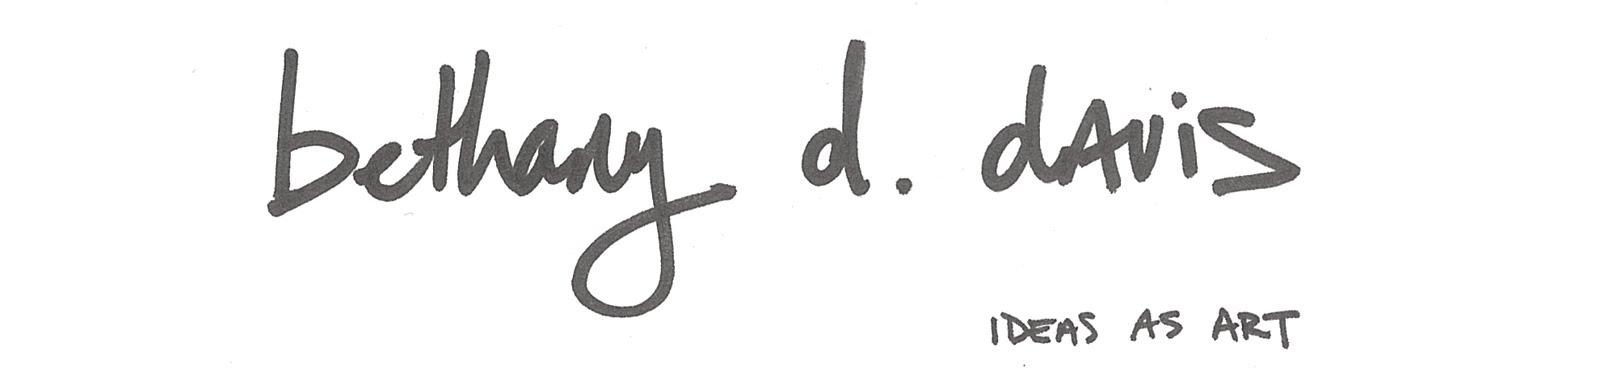 Ideas For Art Sketches. bethany d davis- ideas as art-